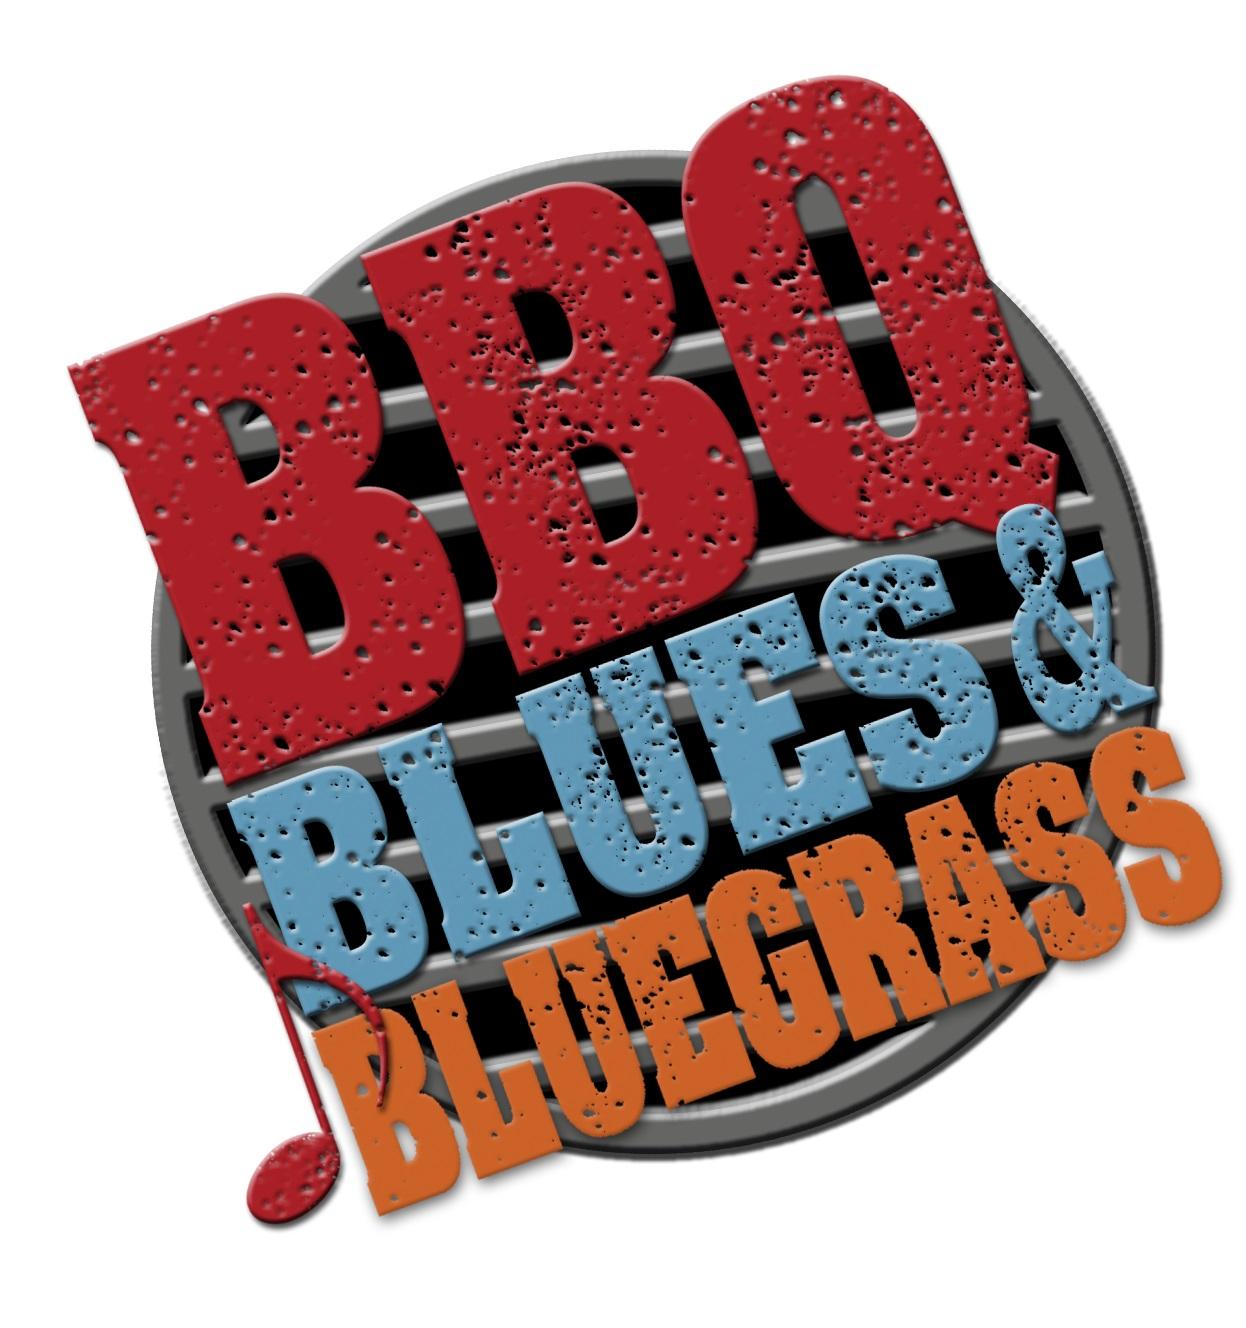 7th Annual BBQ, Blues & Bluegrass